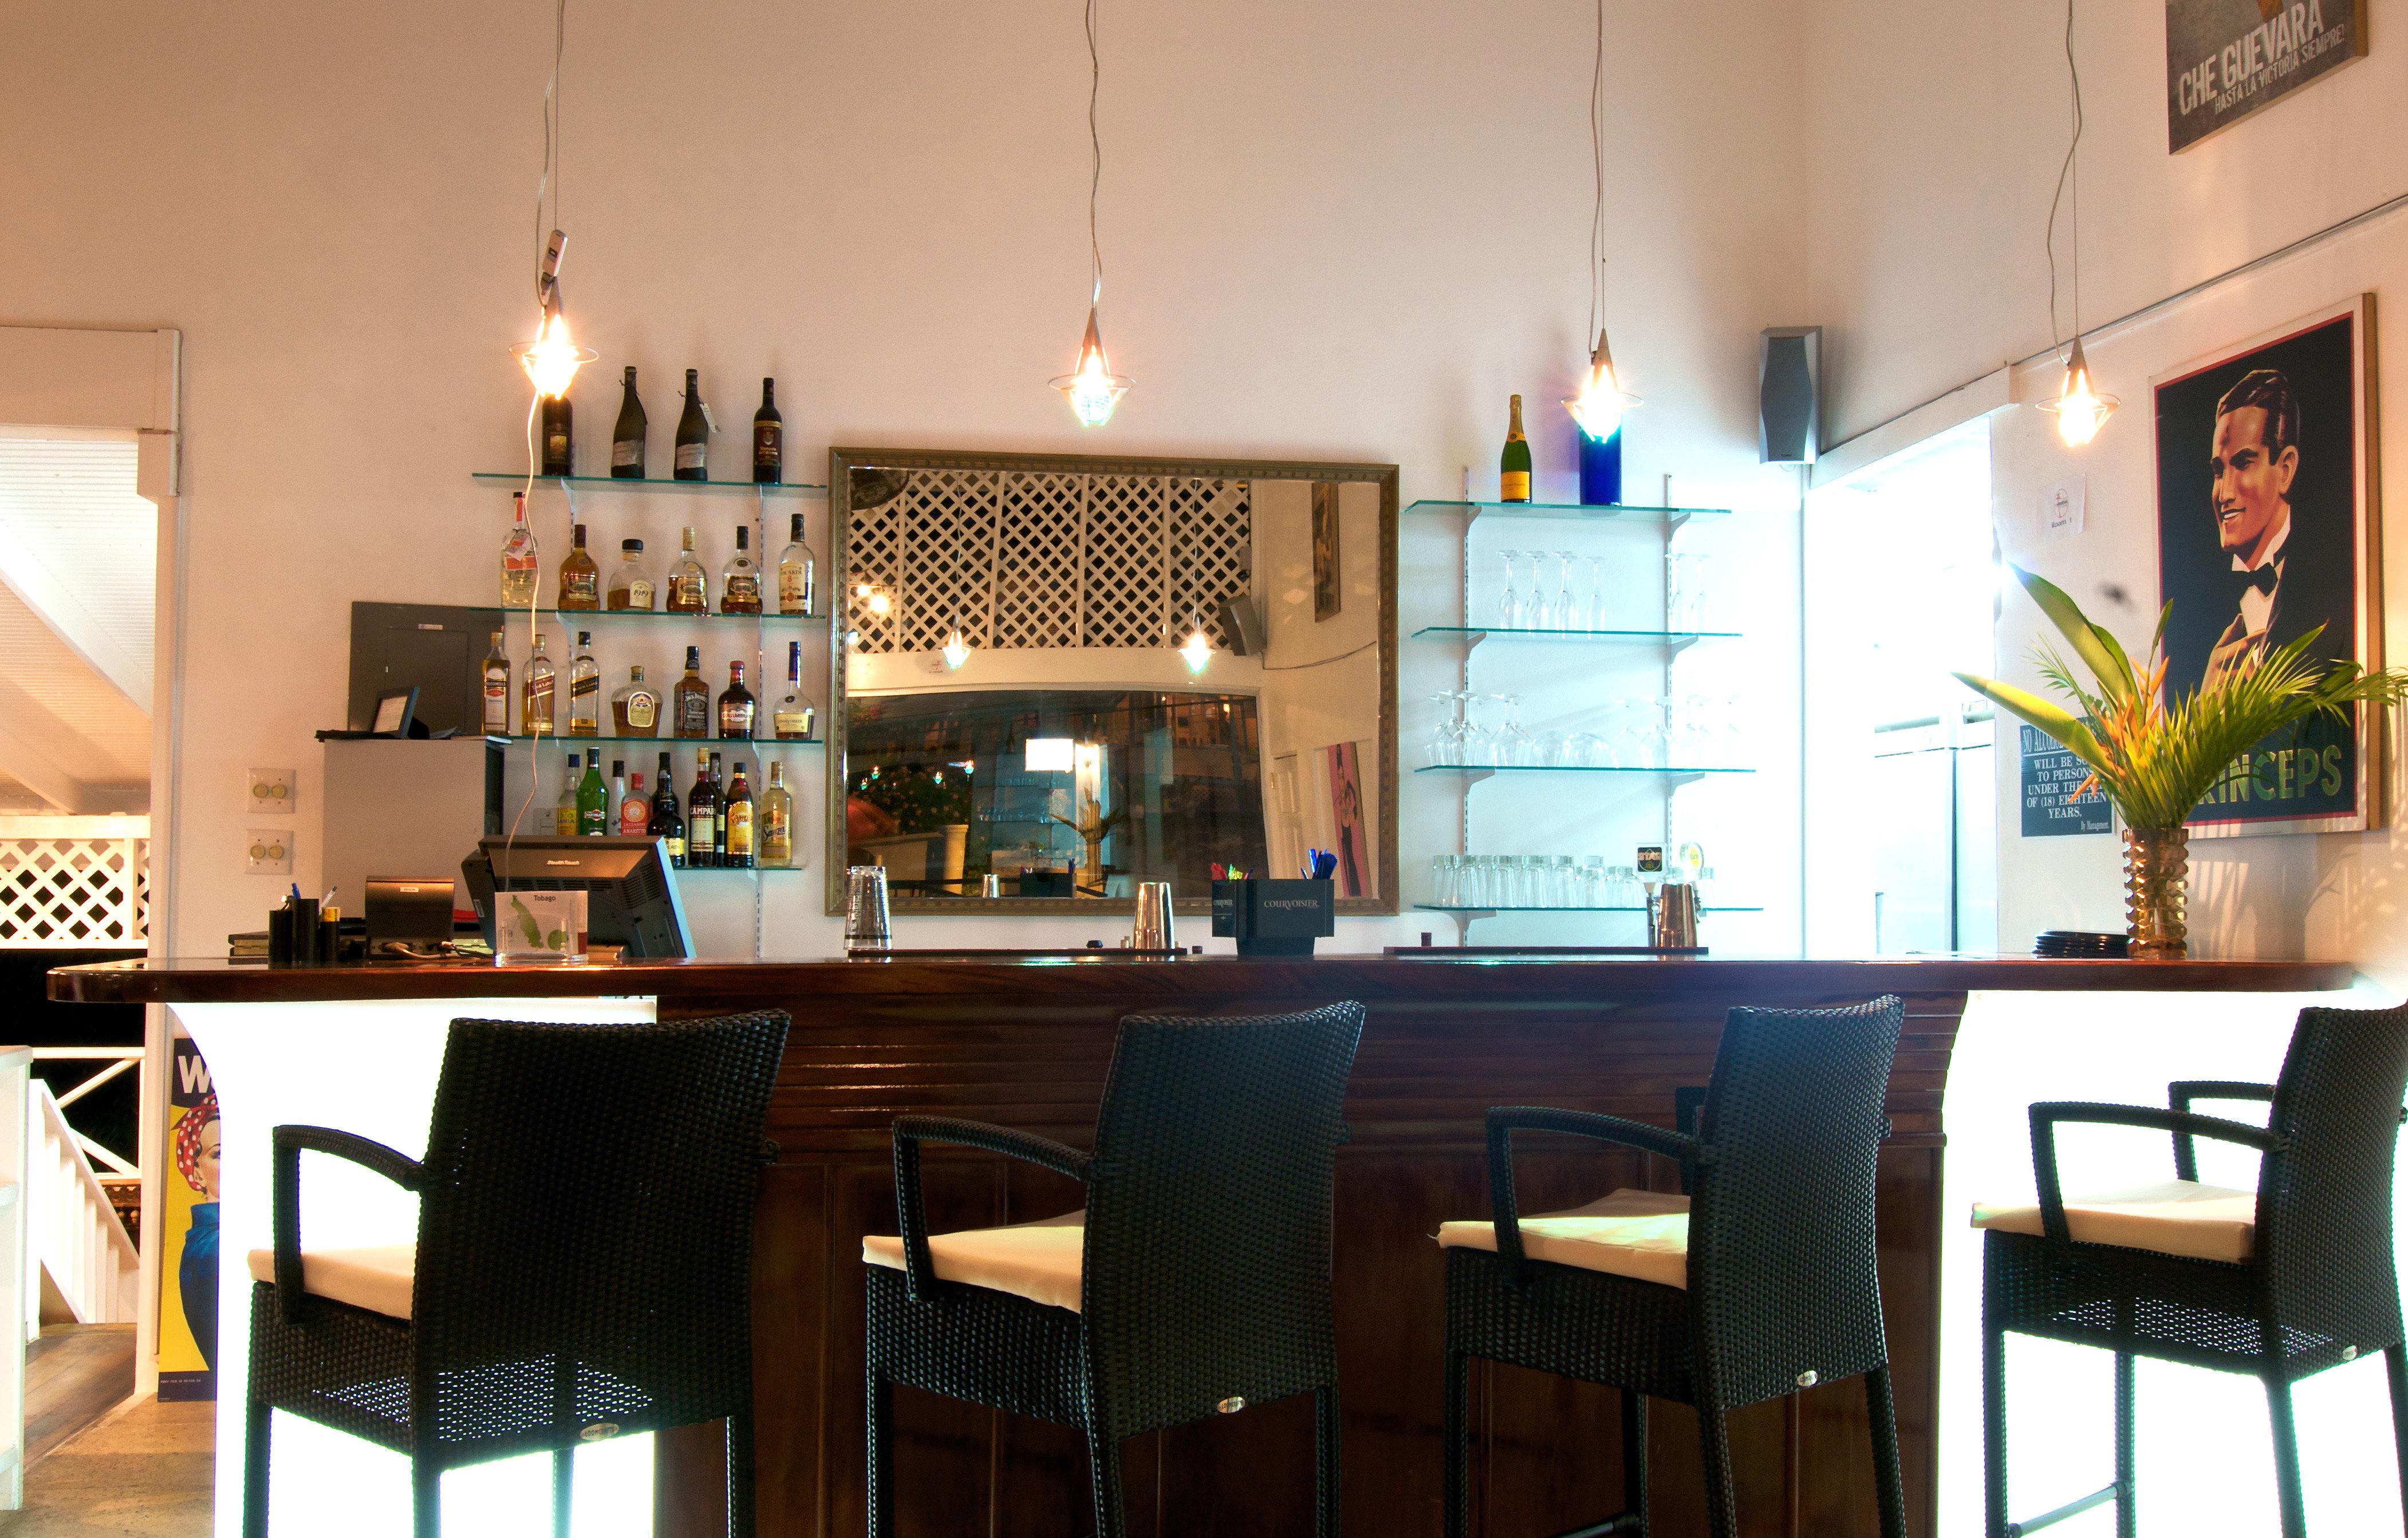 Bar Dining Drink Eat Hip Luxury Modern chair property restaurant home Kitchen cottage